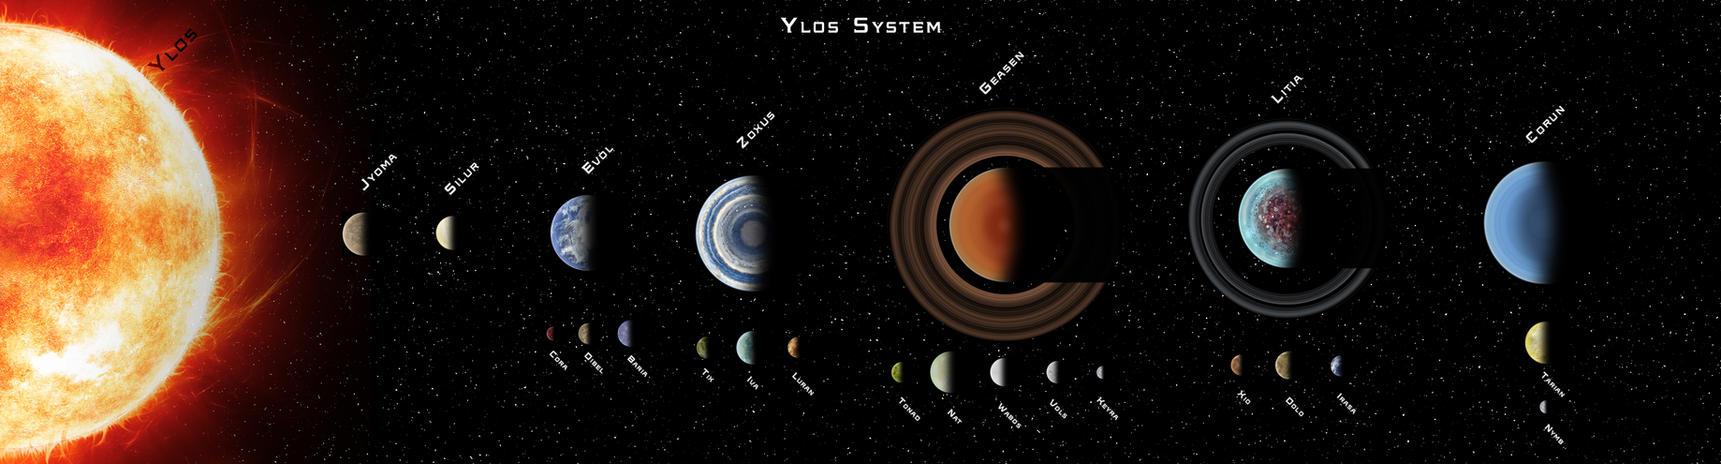 Ylos System by SalesWorlds